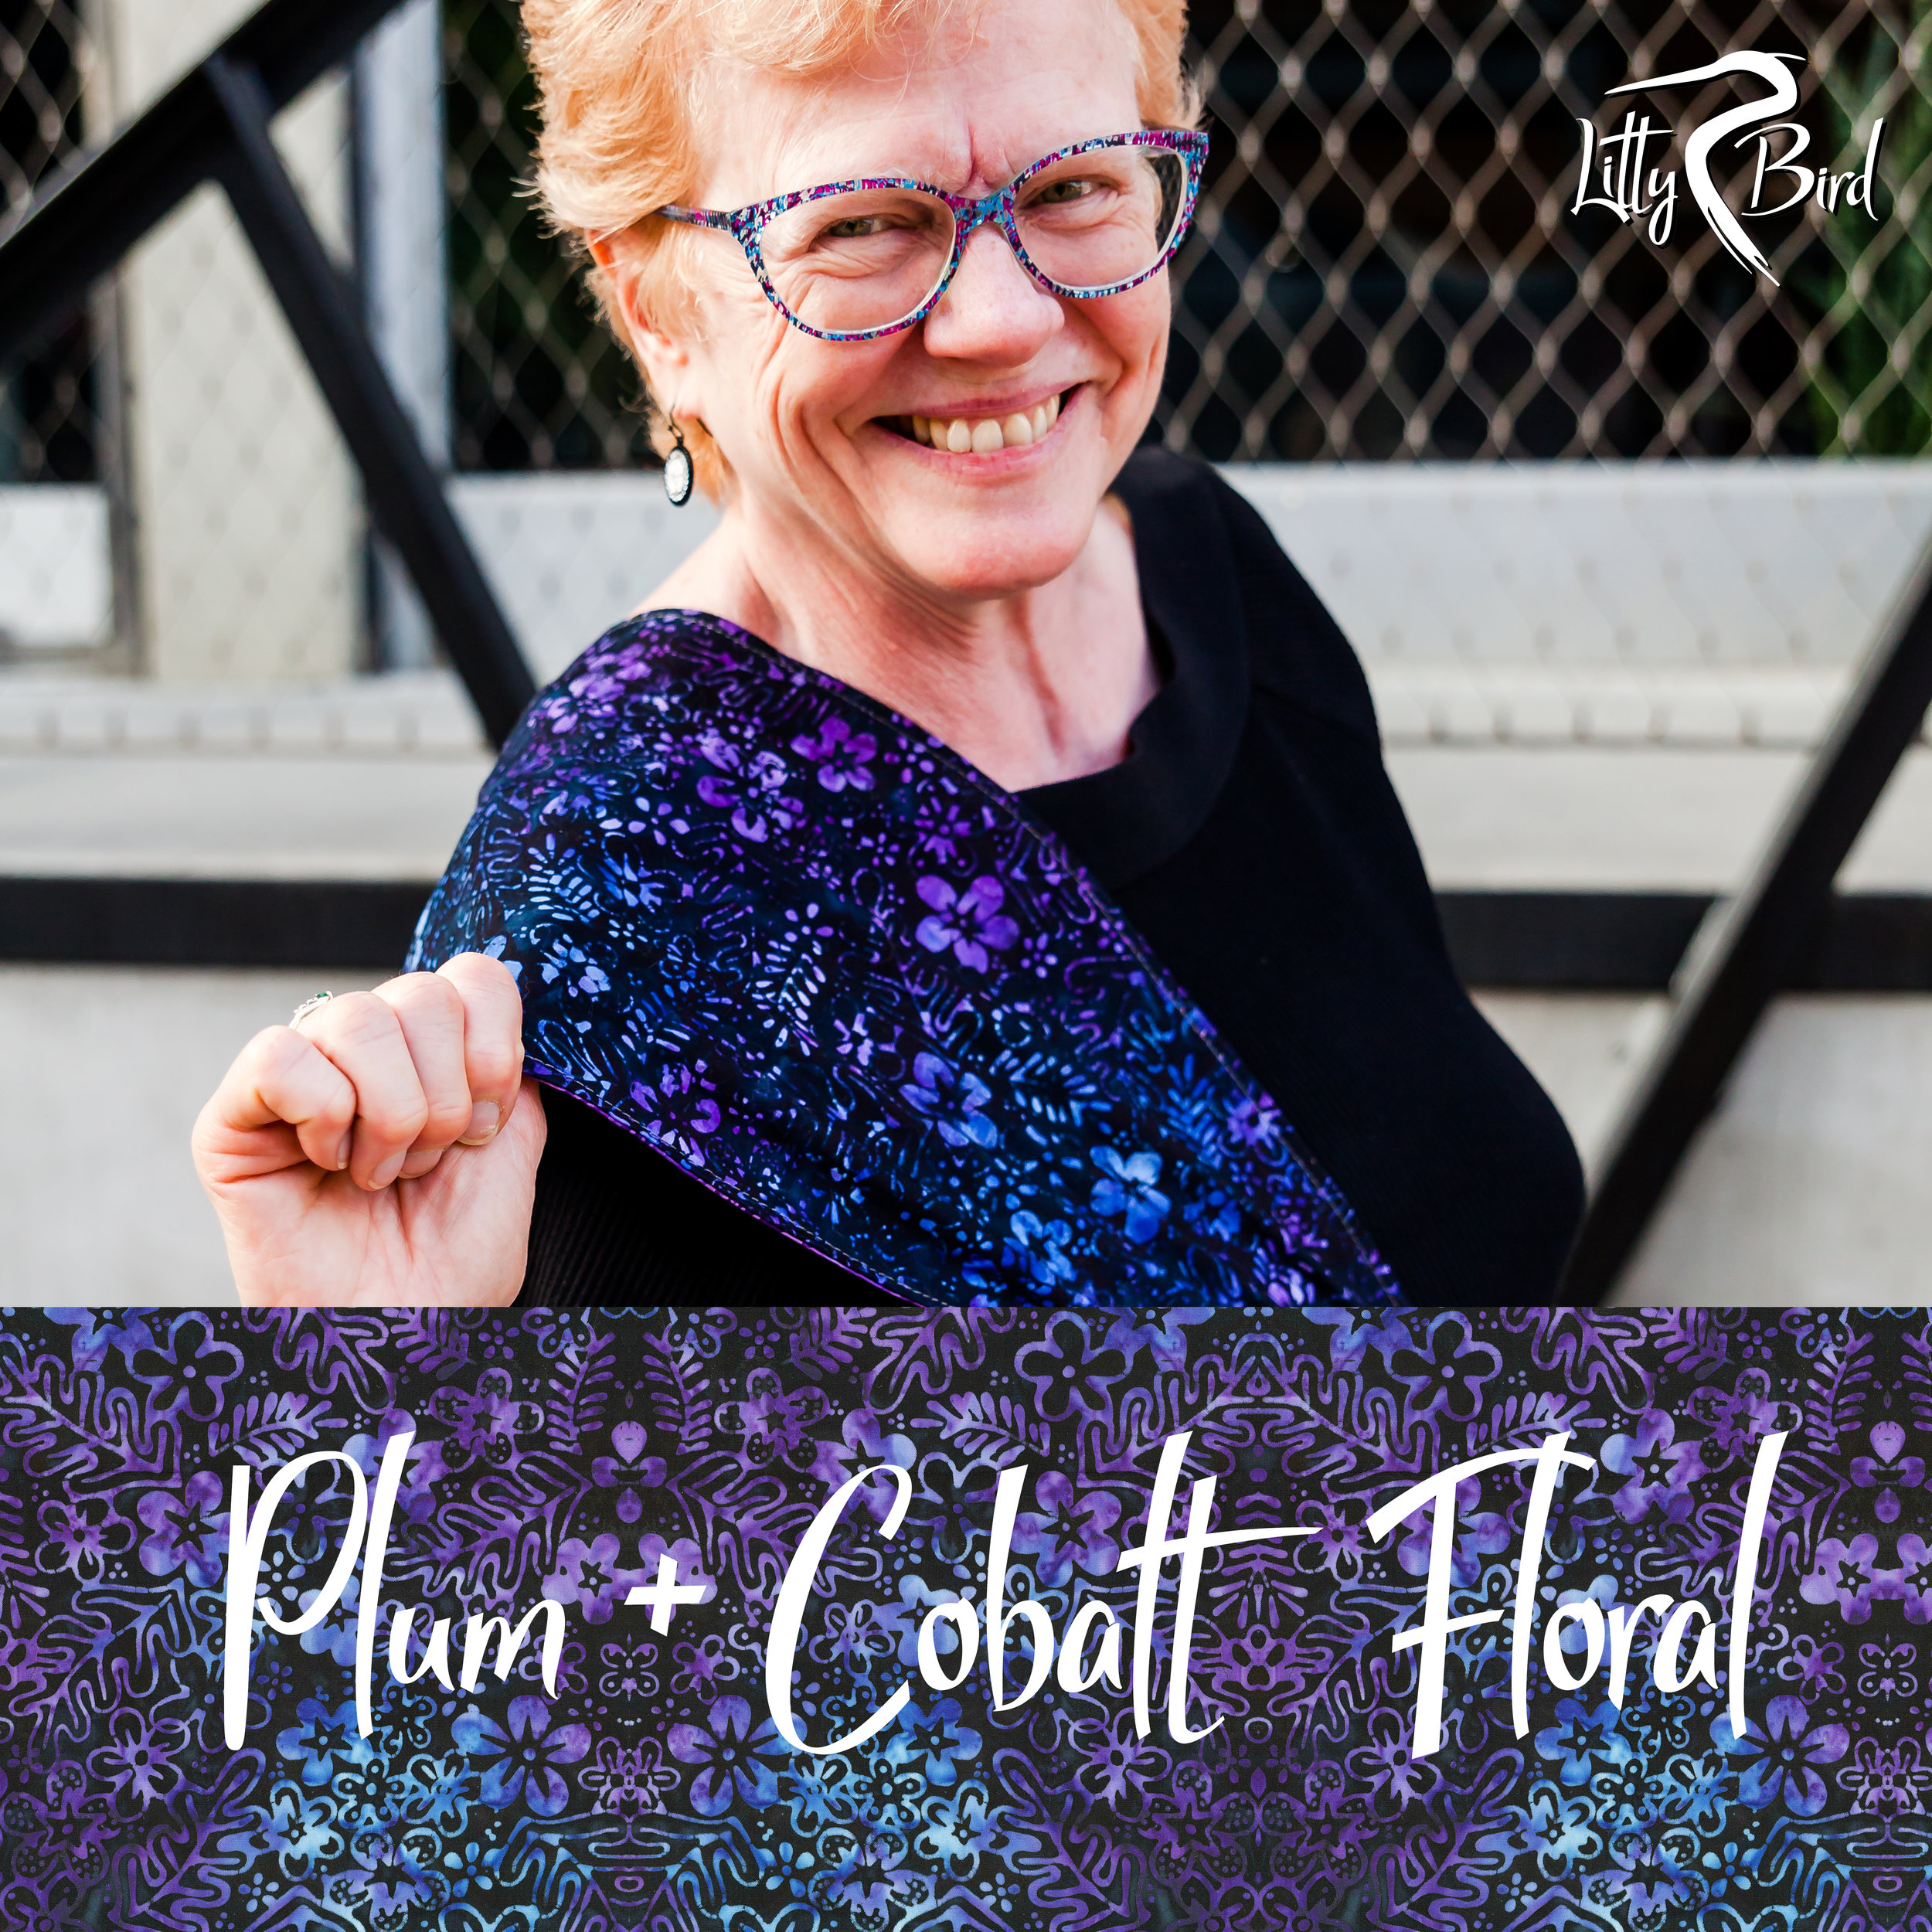 03 Plum and Cobalt Floral - Kathy.jpg